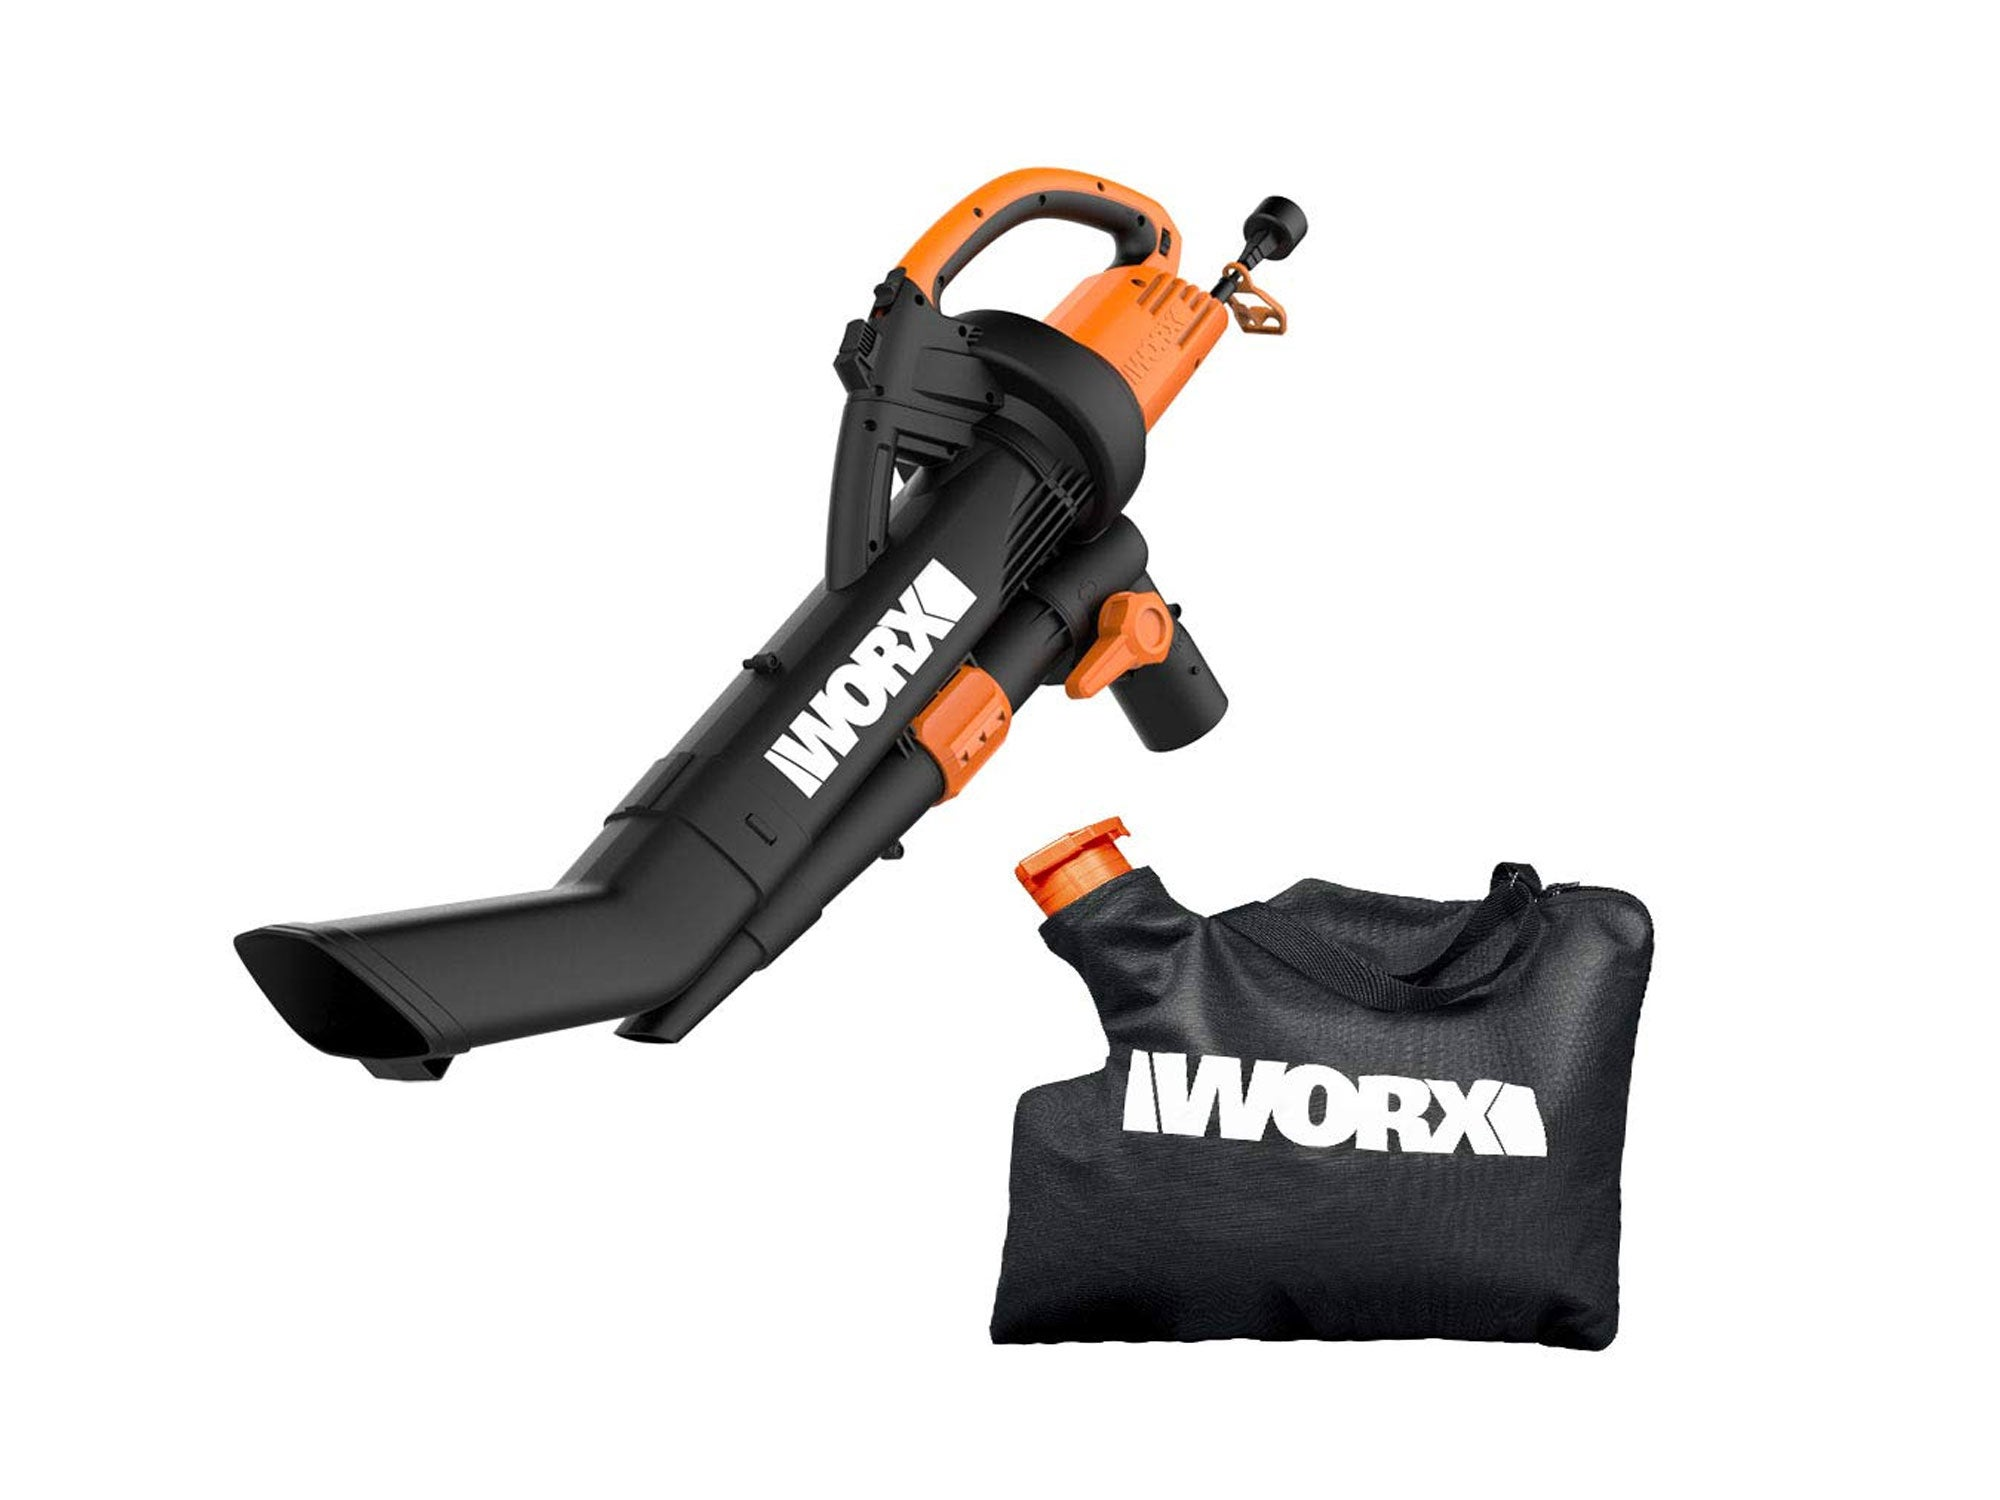 Worx Electric Blower/Mulcher/Vacuum